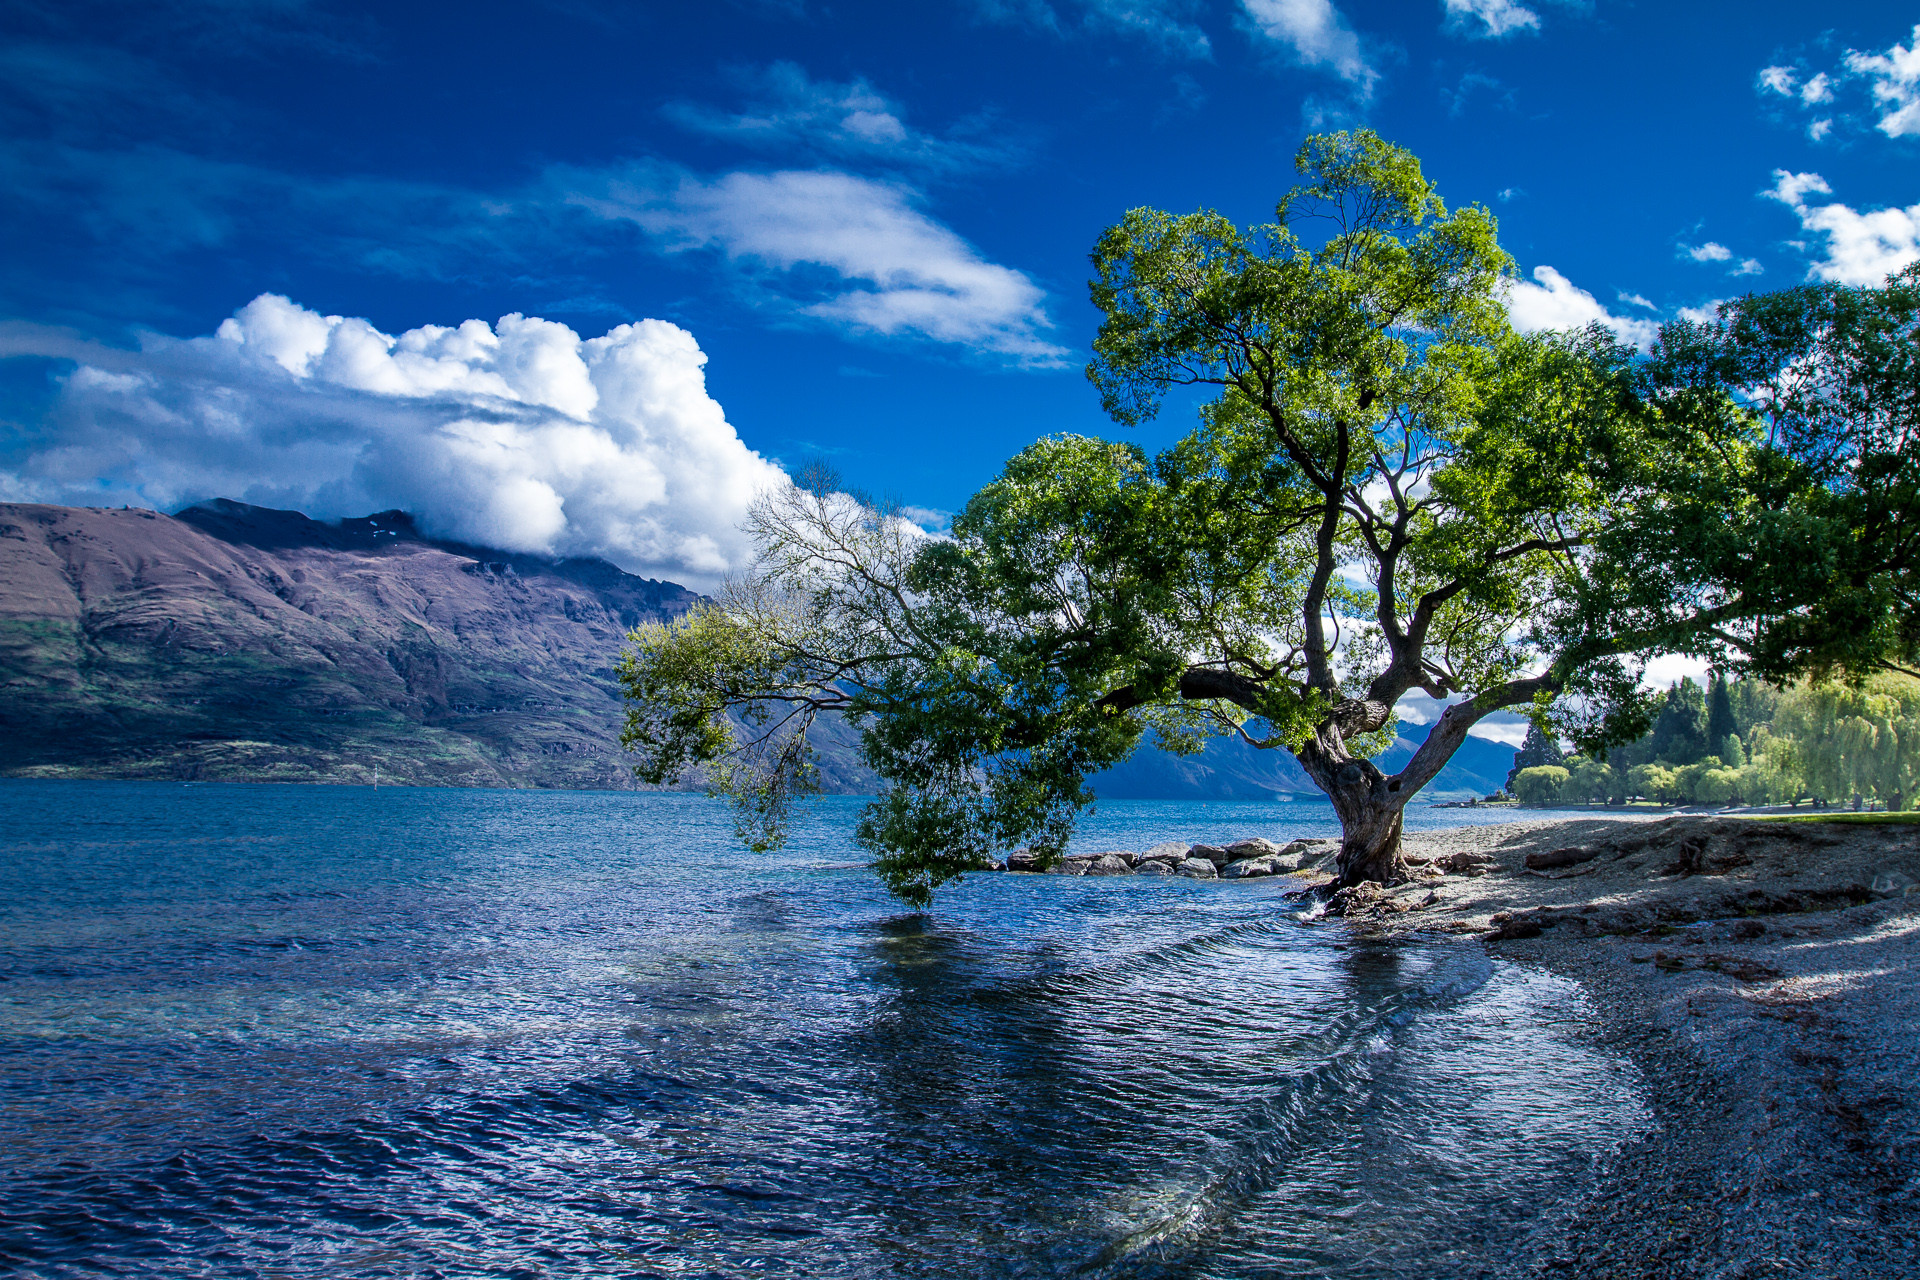 Lake Wakatipu Backgrounds on Wallpapers Vista